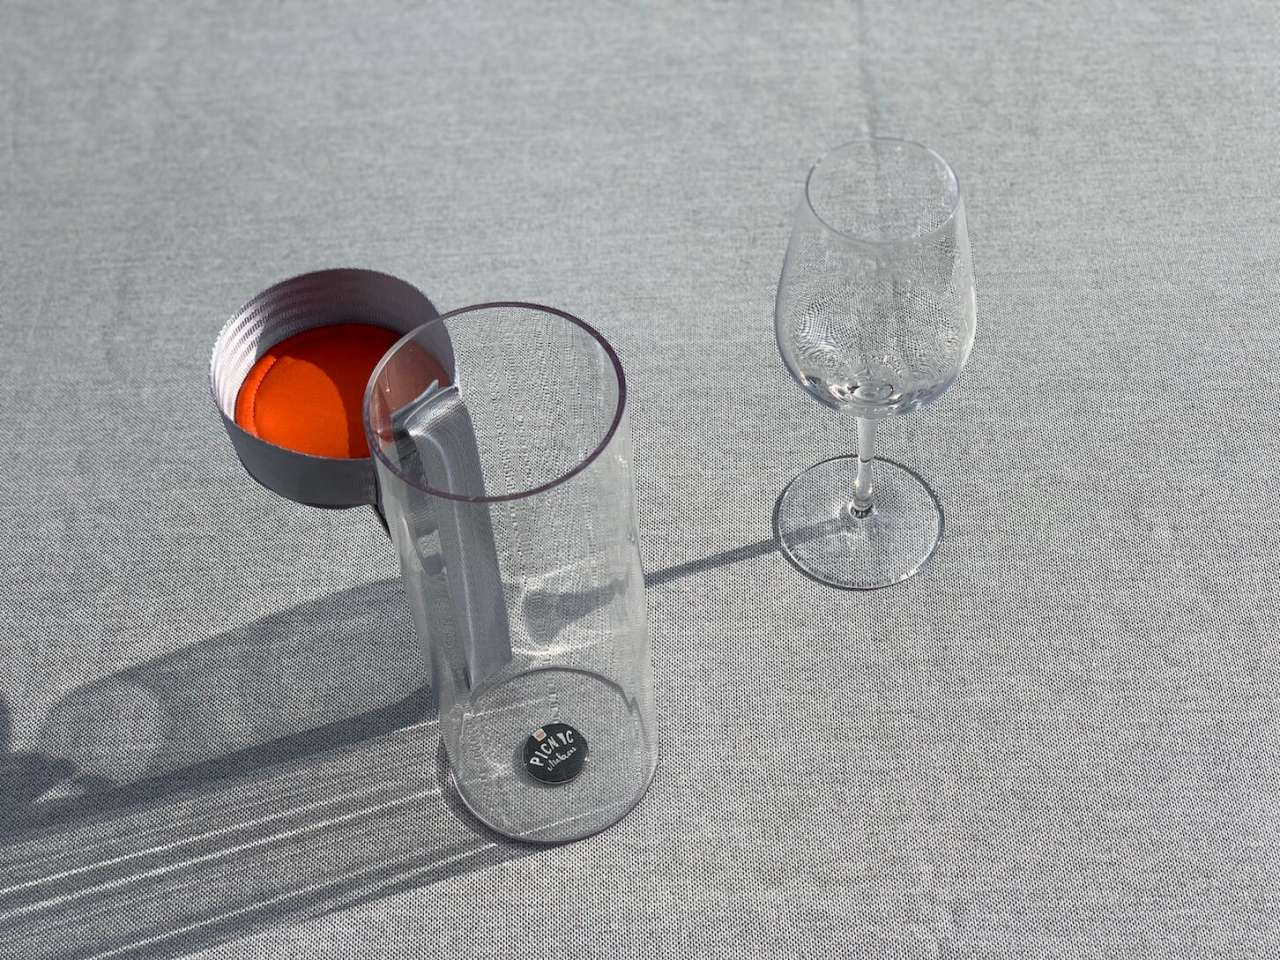 Suba Picnic-Makers Ein perfekter Weinkühler